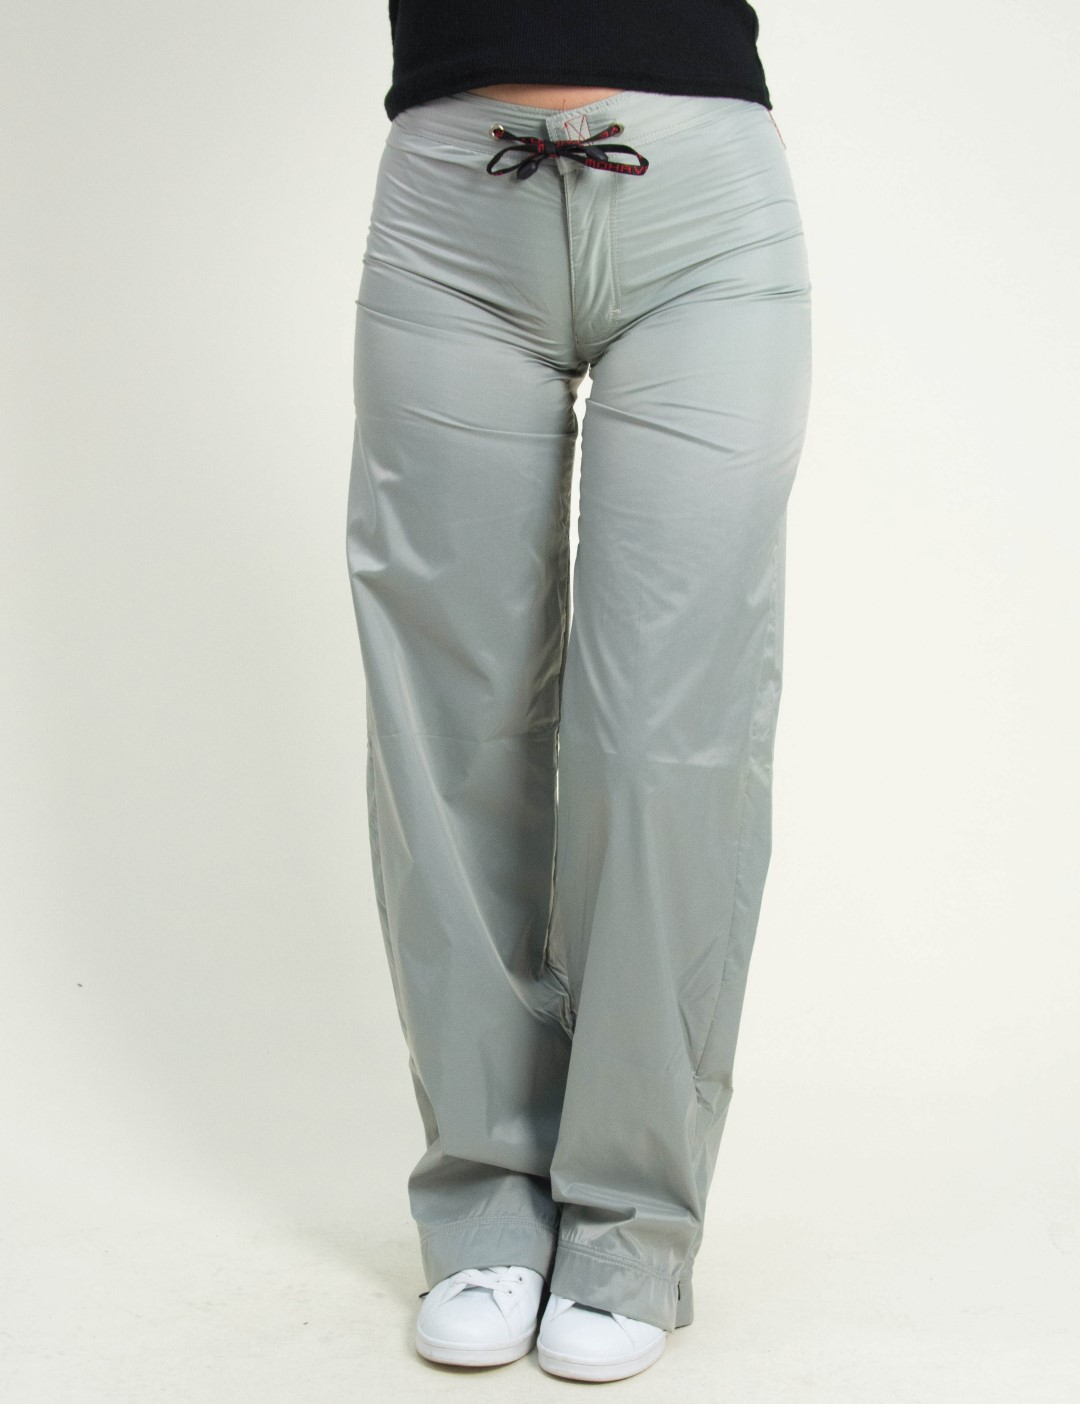 2643c516dd36 Γυναικεία γκρι αδιάβροχη παντελόνα DF203F